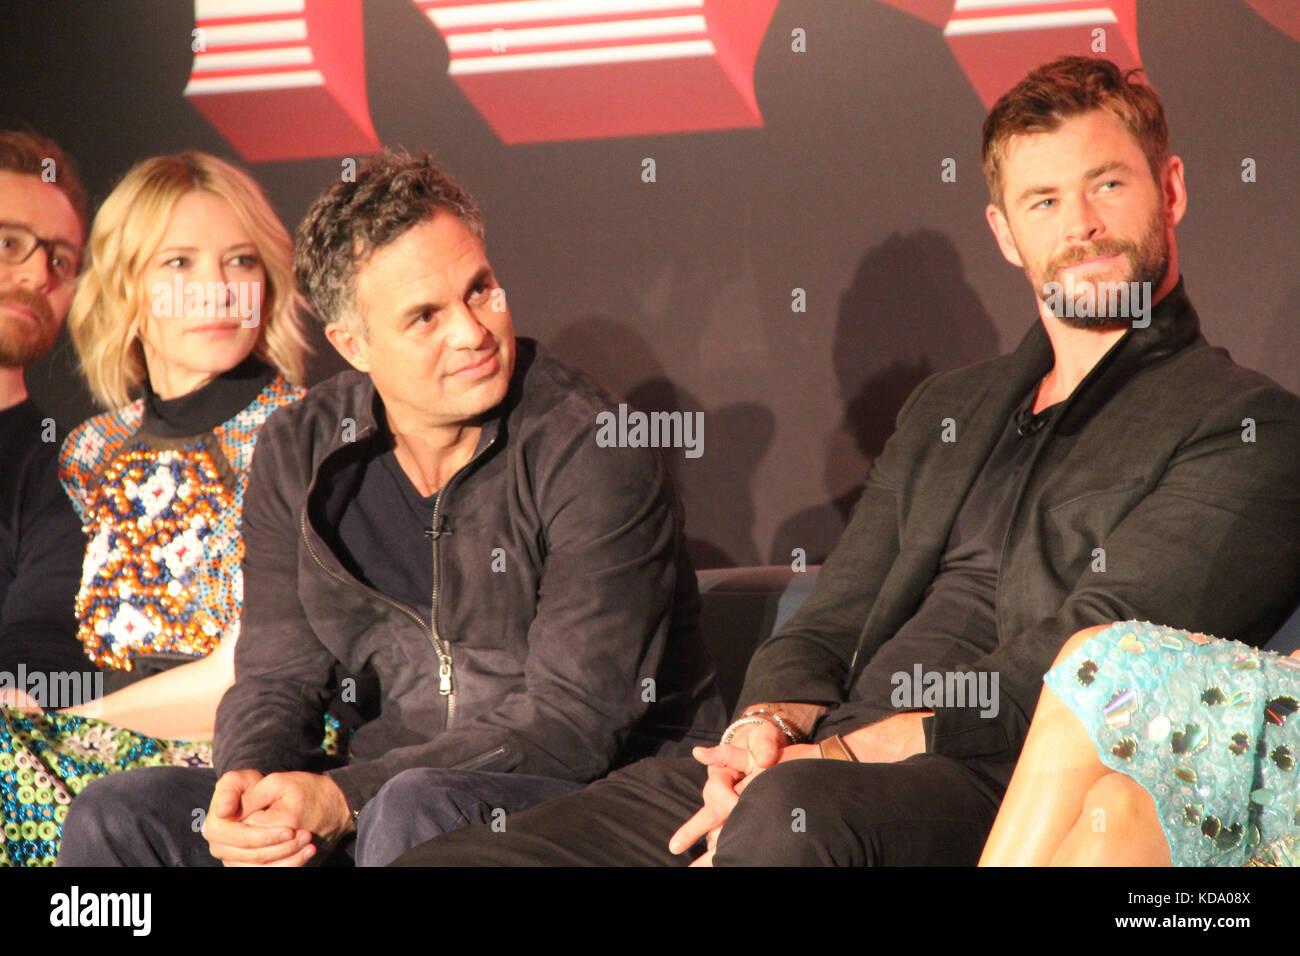 Los Angeles, USA. 11th Oct, 2017. Cate Blanchett, Mark Ruffalo, Chris Hemsworth 10/11/2017 ?gThor: Ragnarok?h Press - Stock Image